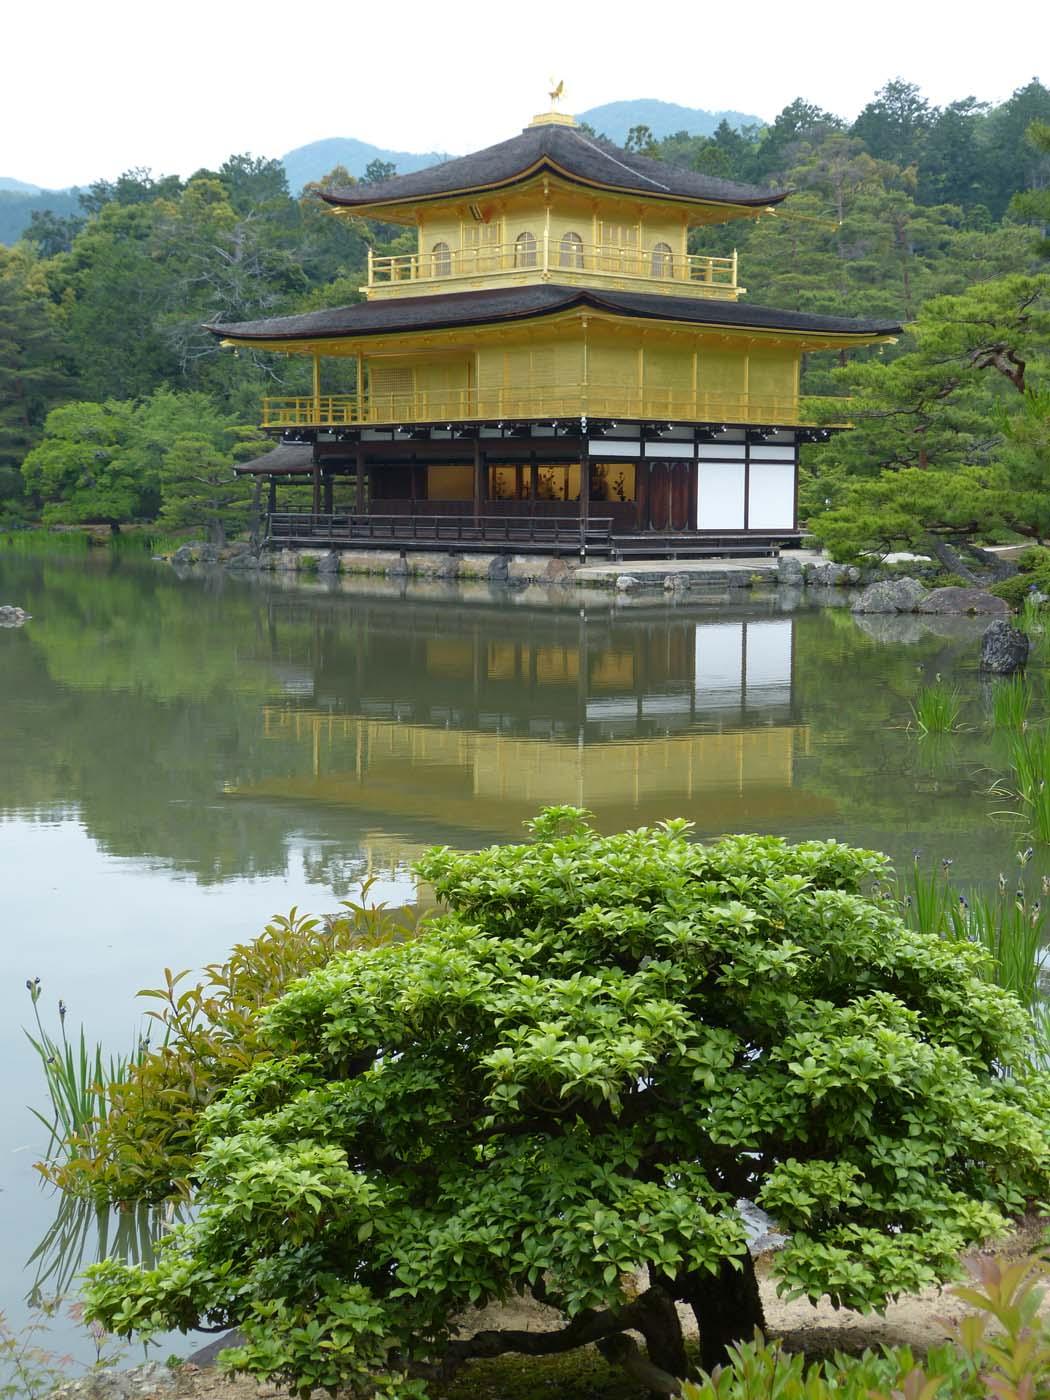 Kyoto - Temple de l'or